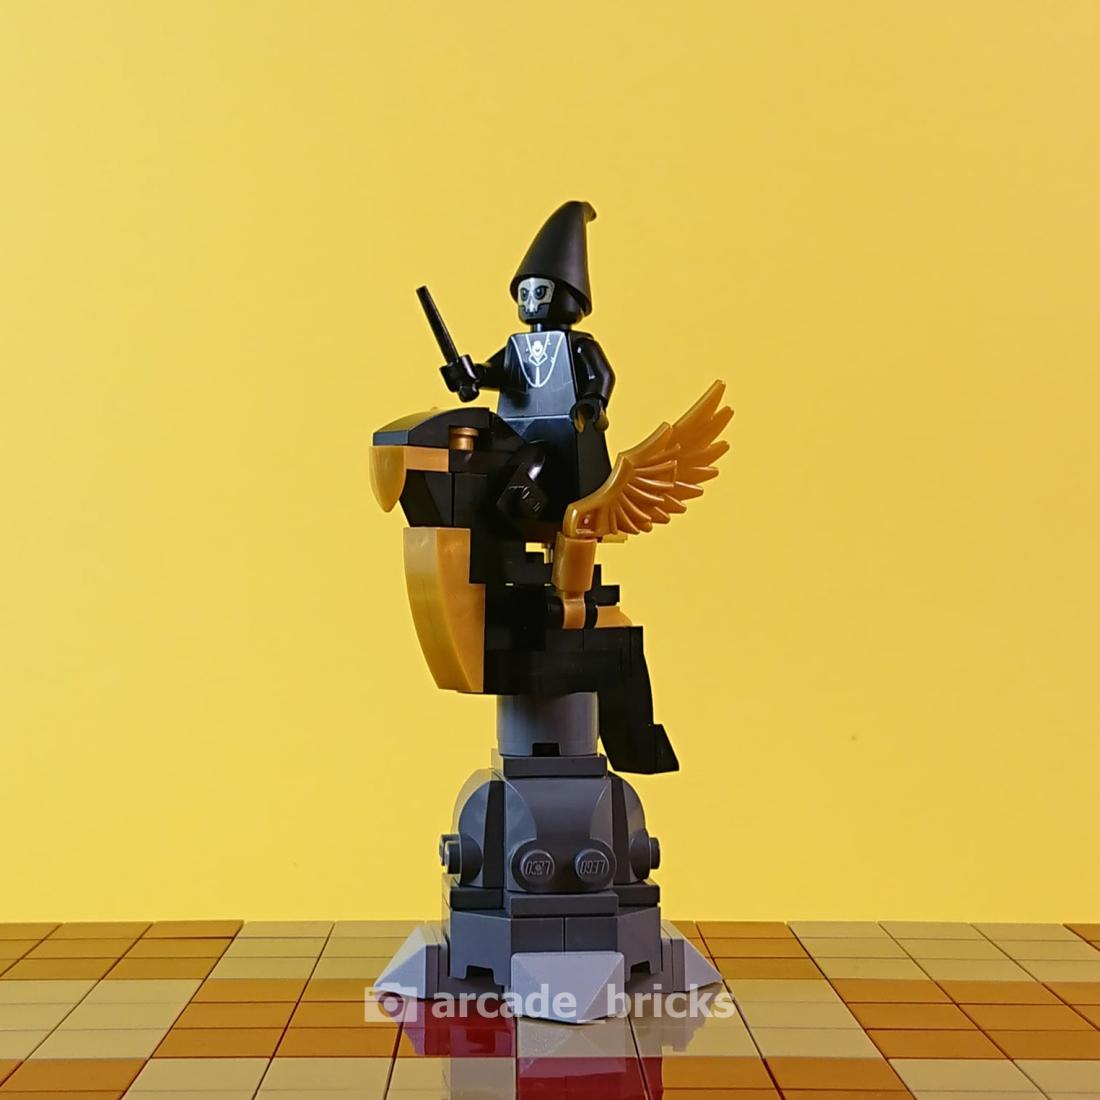 arcade_bricks_chess_evil_04_knight